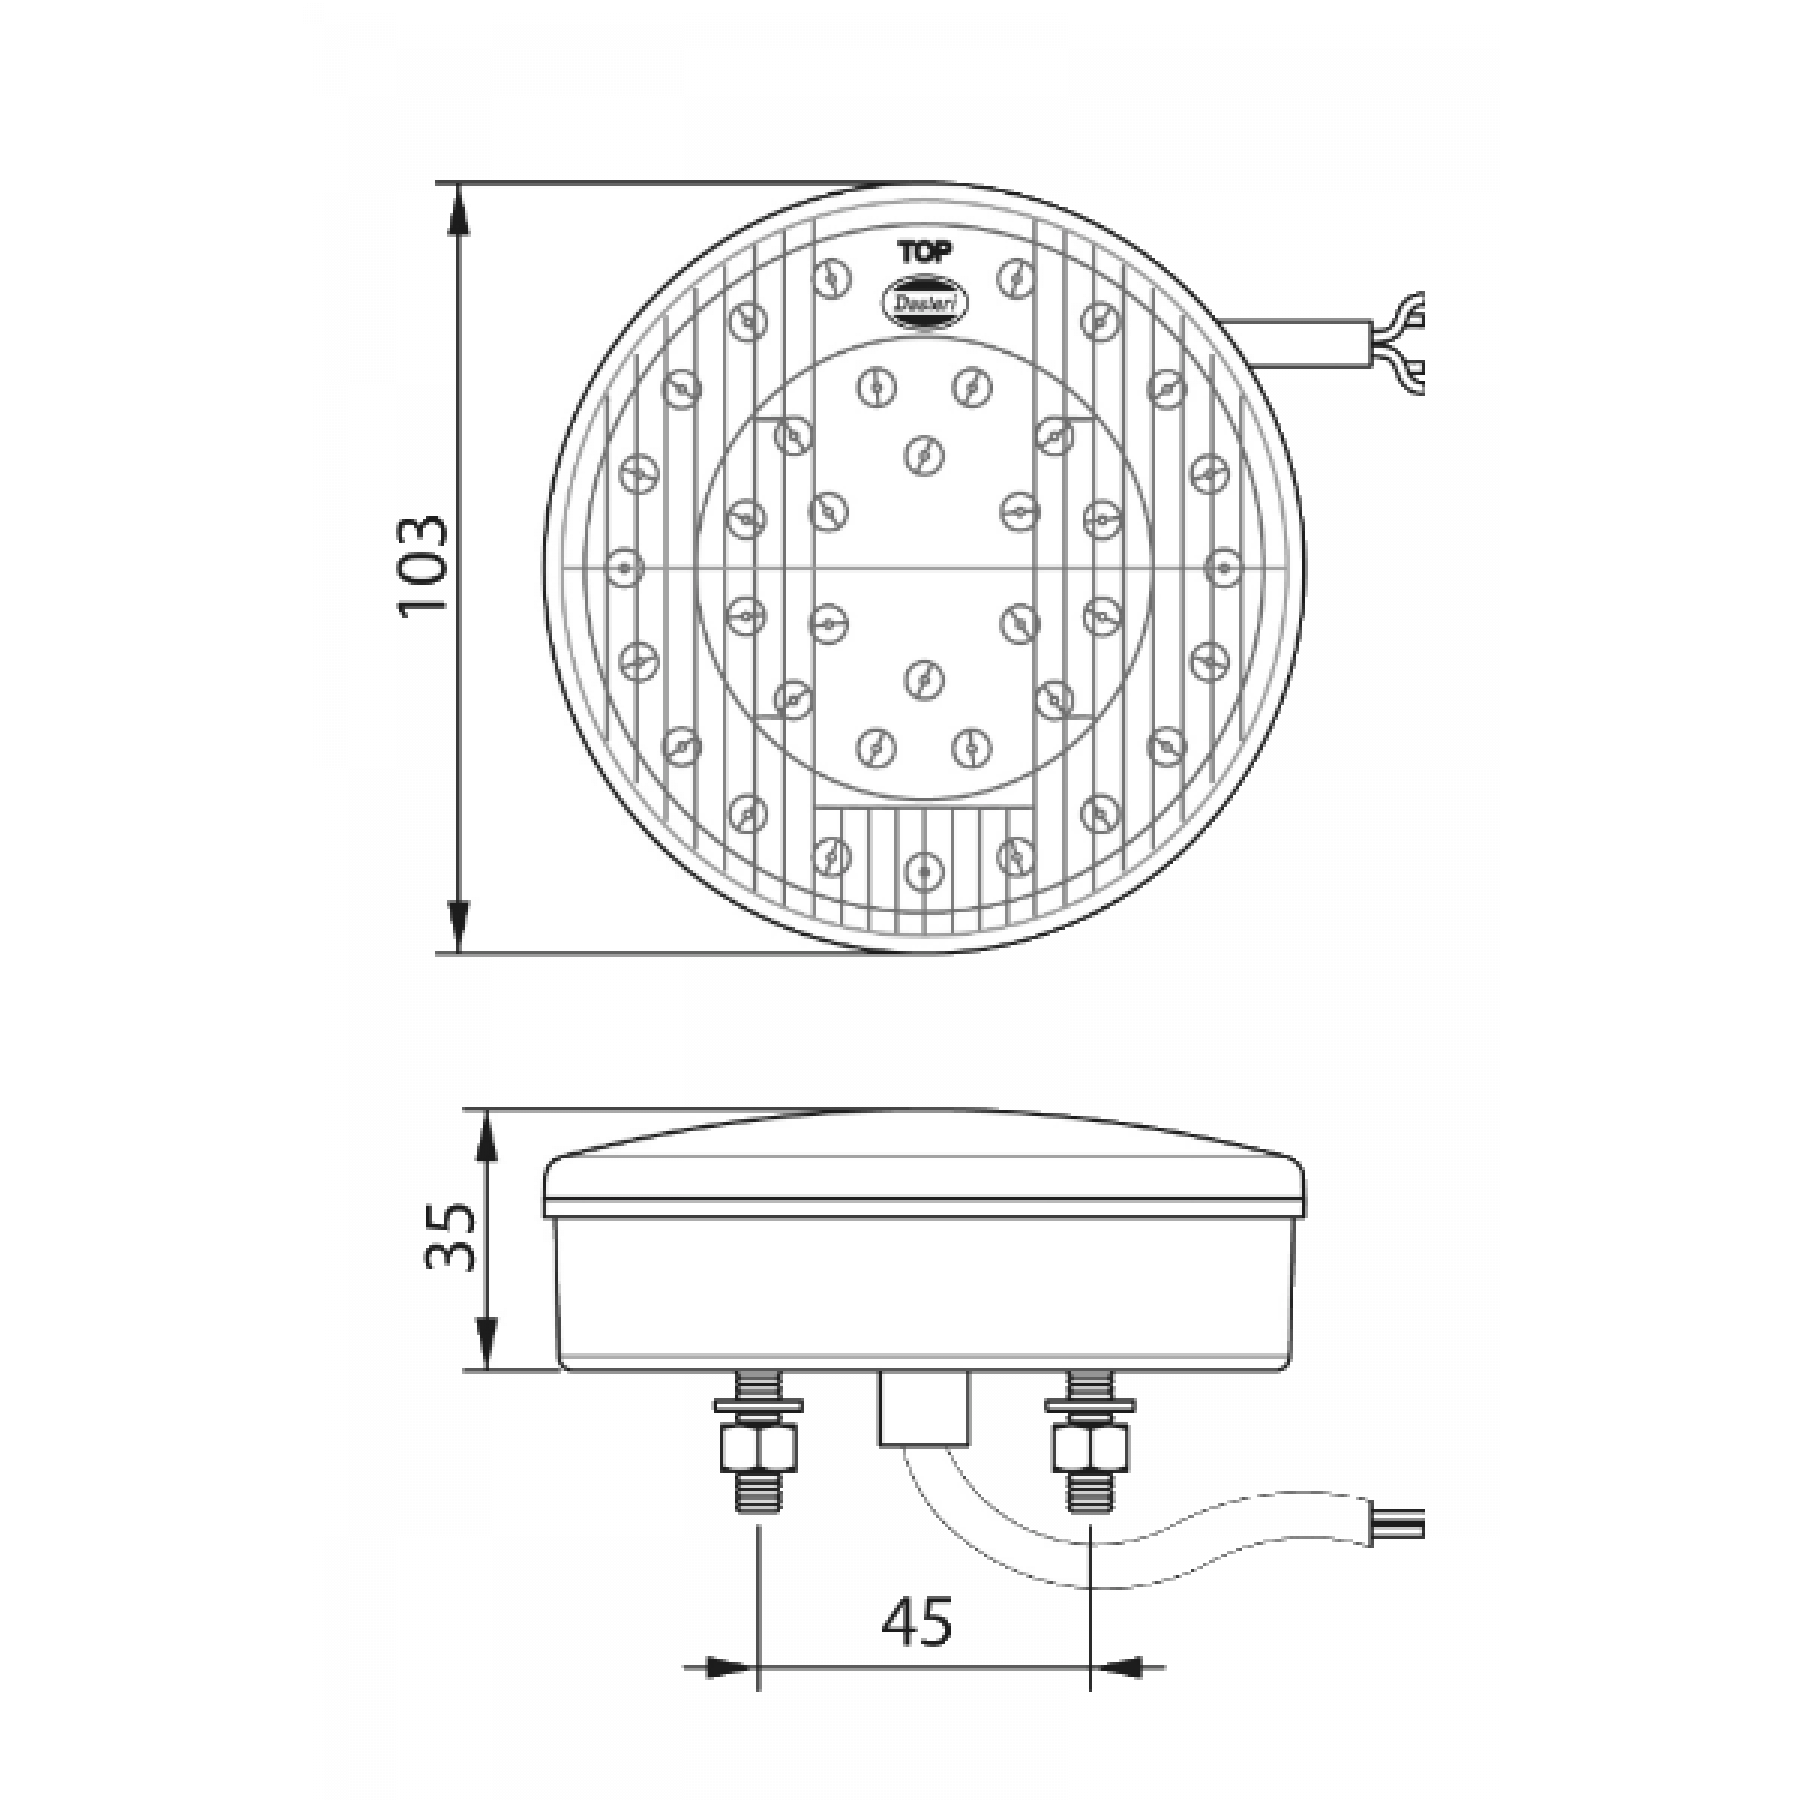 Achterlicht LED rond Ø 103mm 3 functies 24v